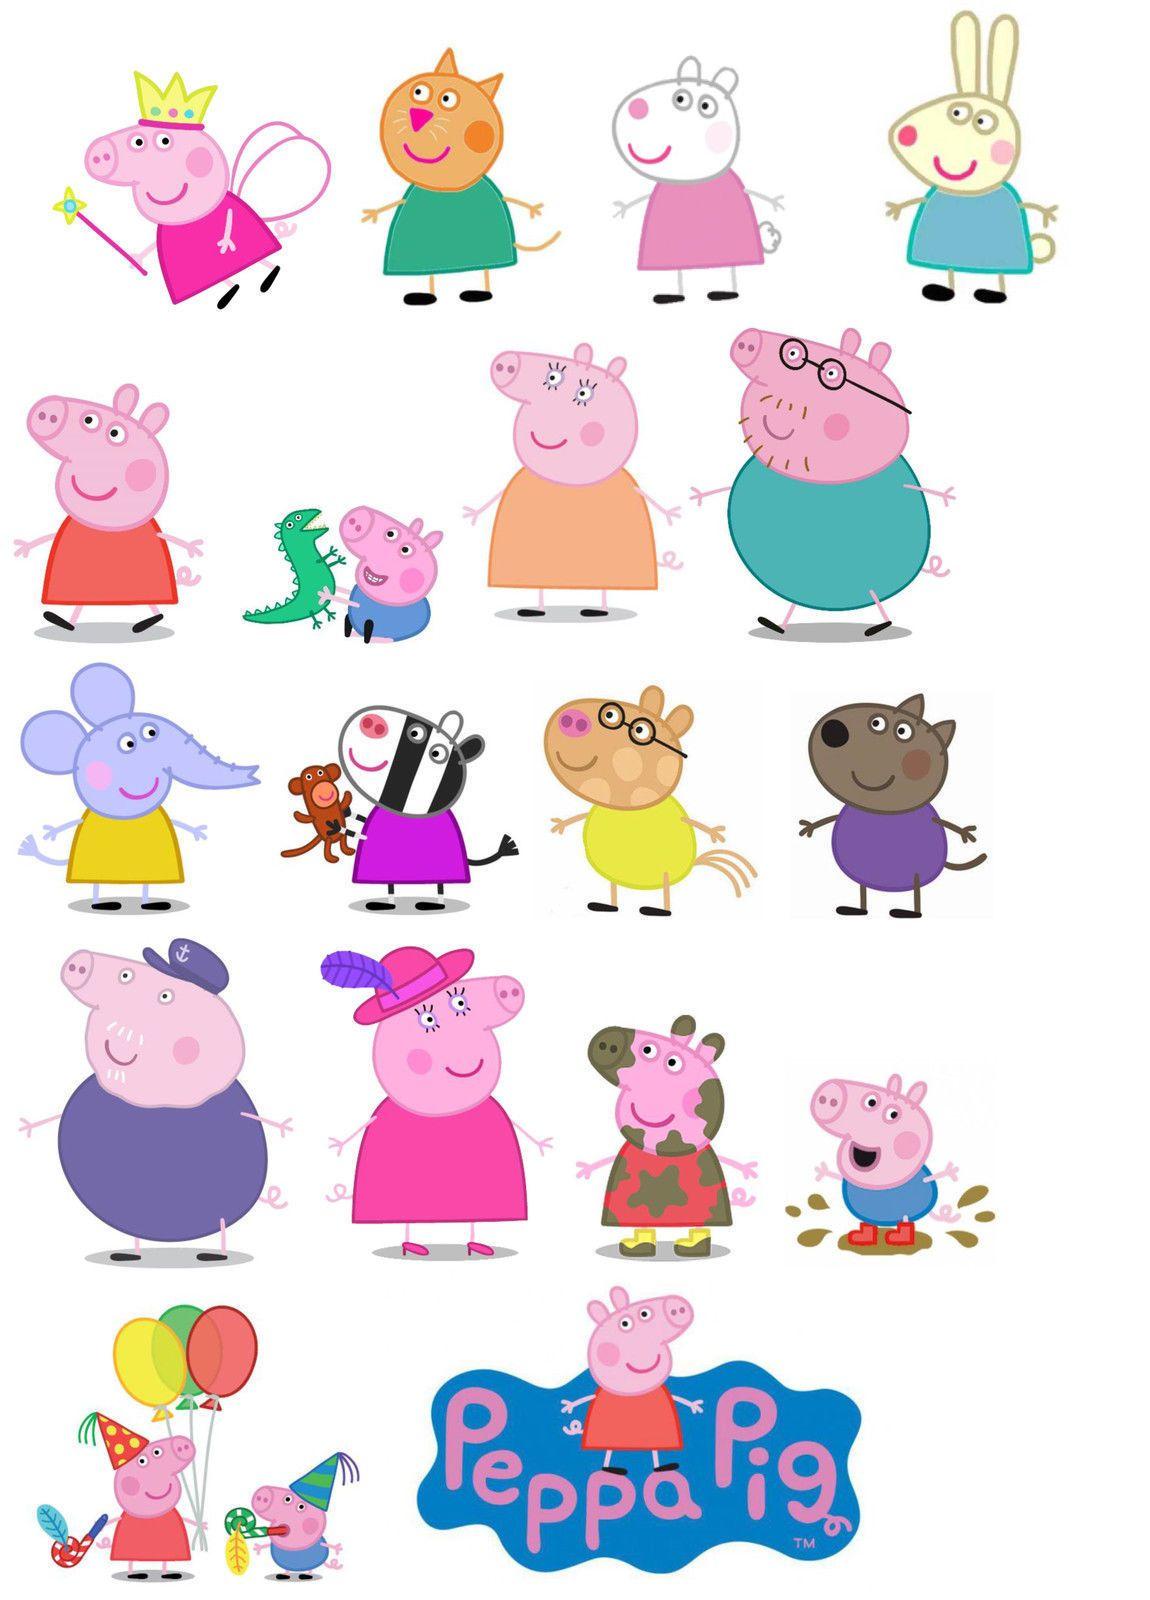 Peppa Pig Edible Wafer Card Cake Topper Scene